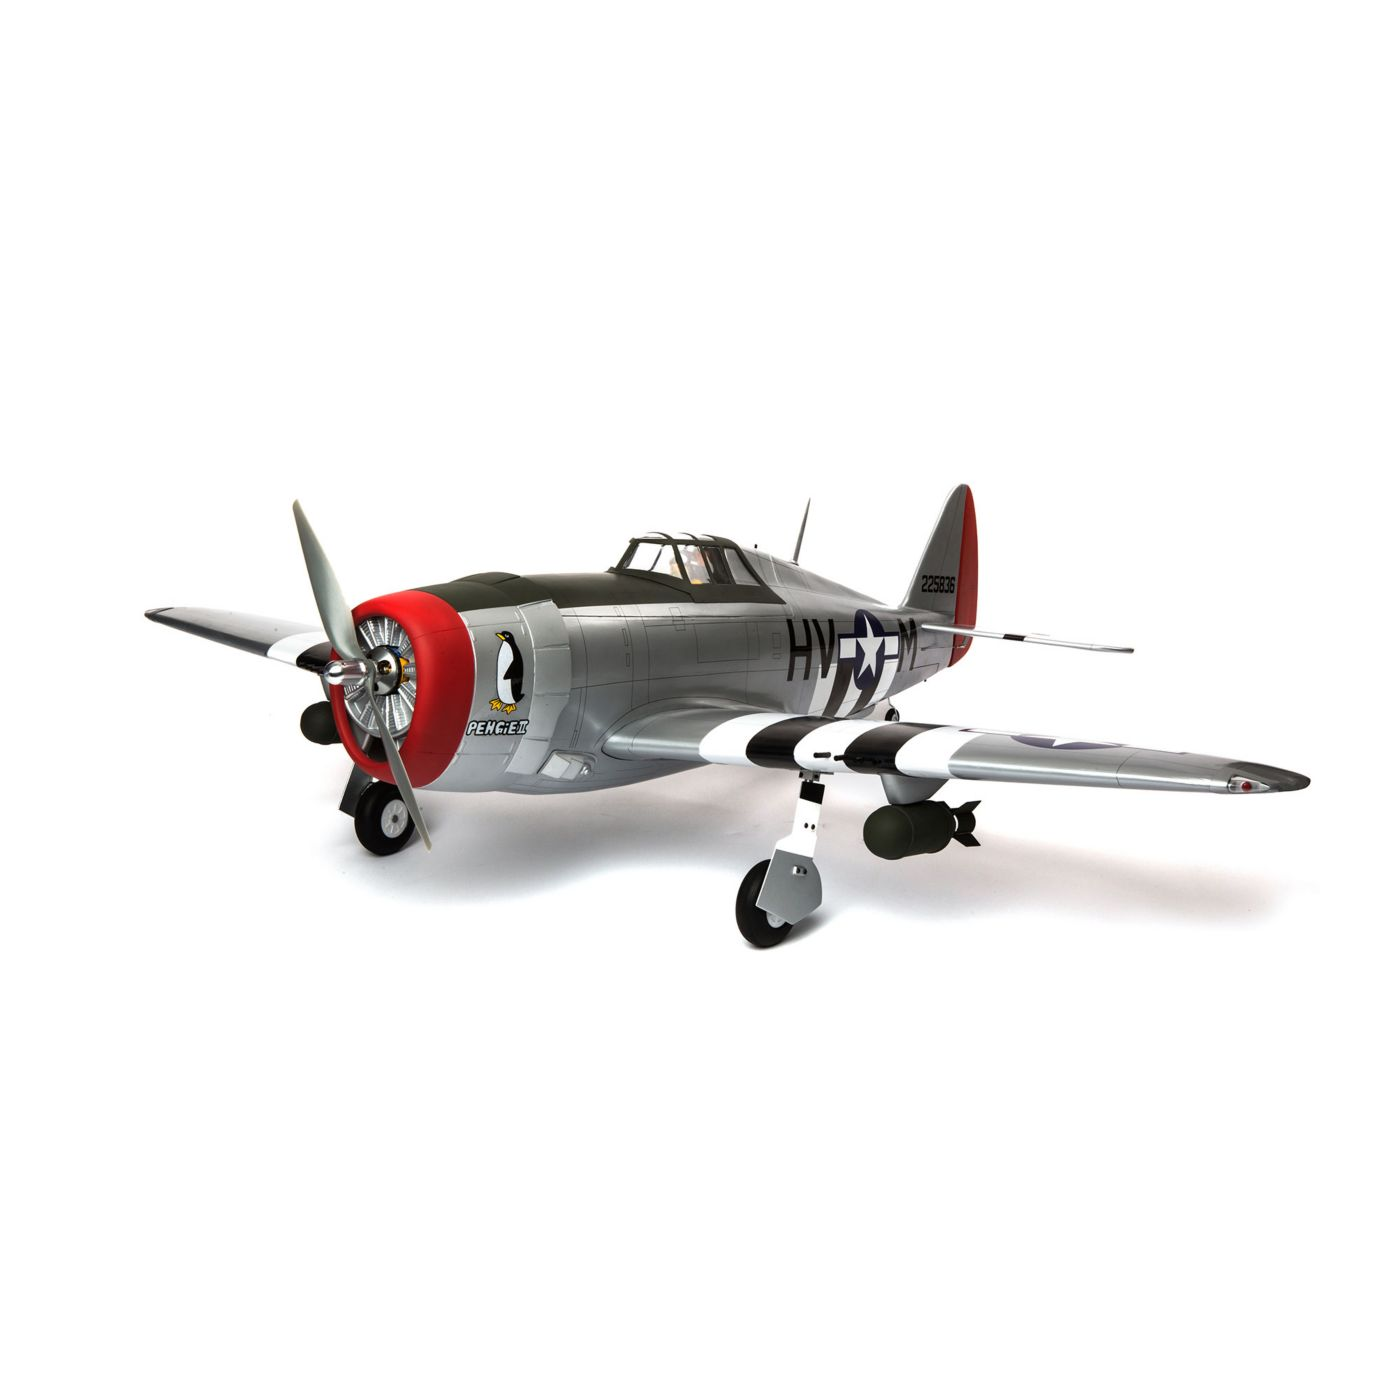 P-47D Thunderbolt hangar 9